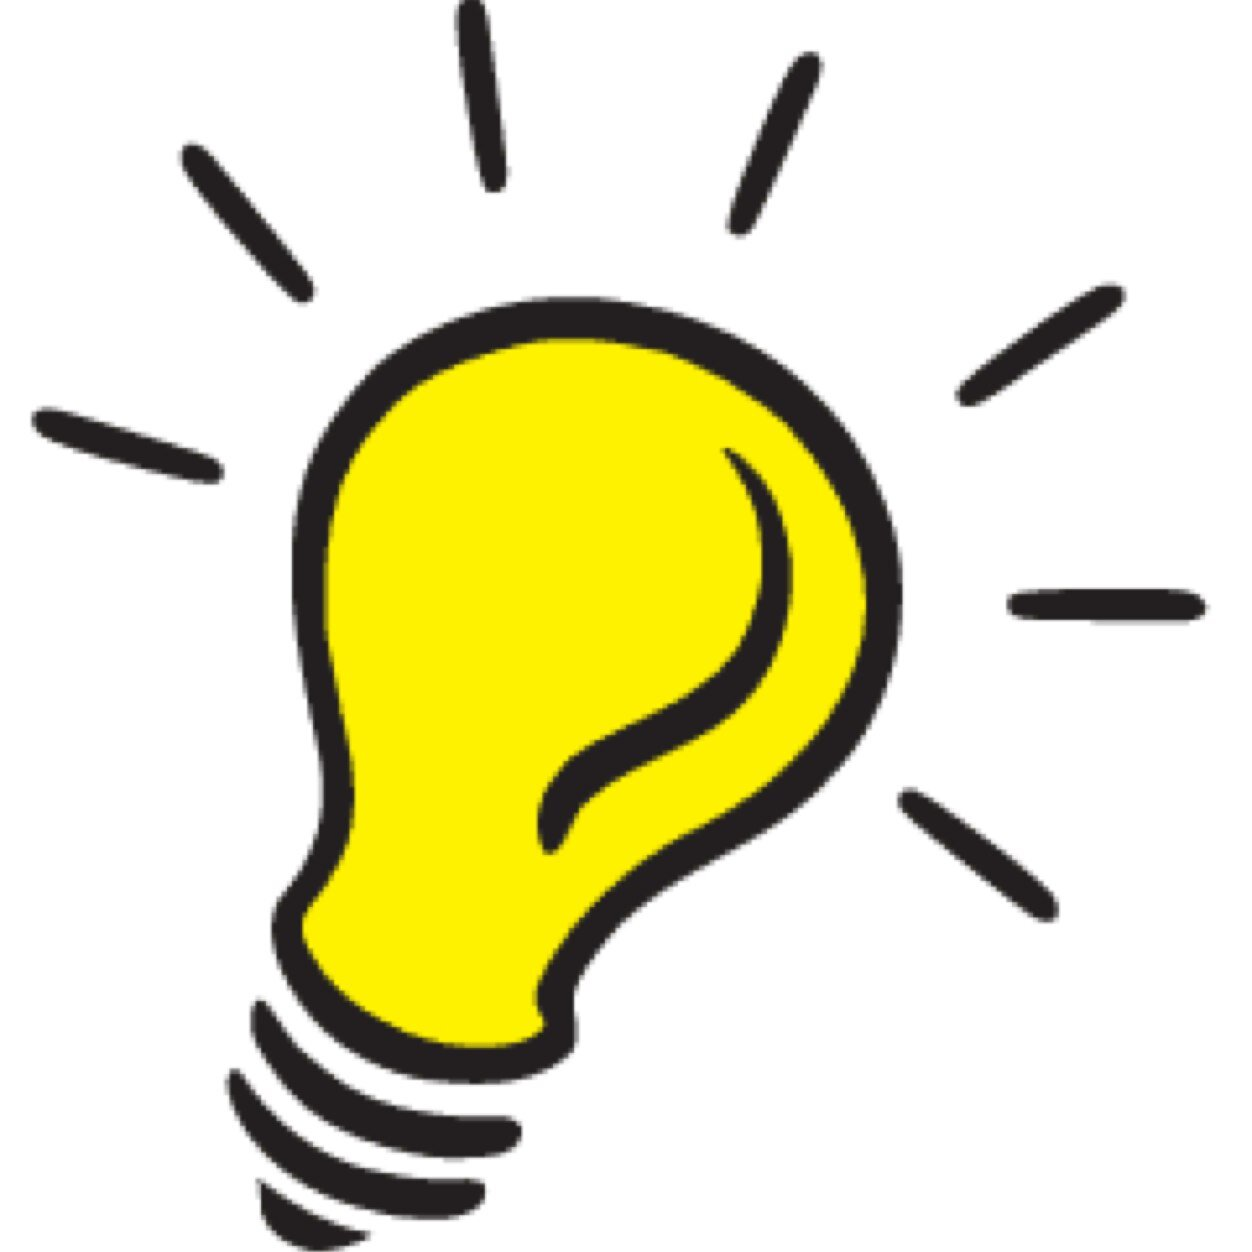 1252x1252 Light Bulb Clipart Transparent Background